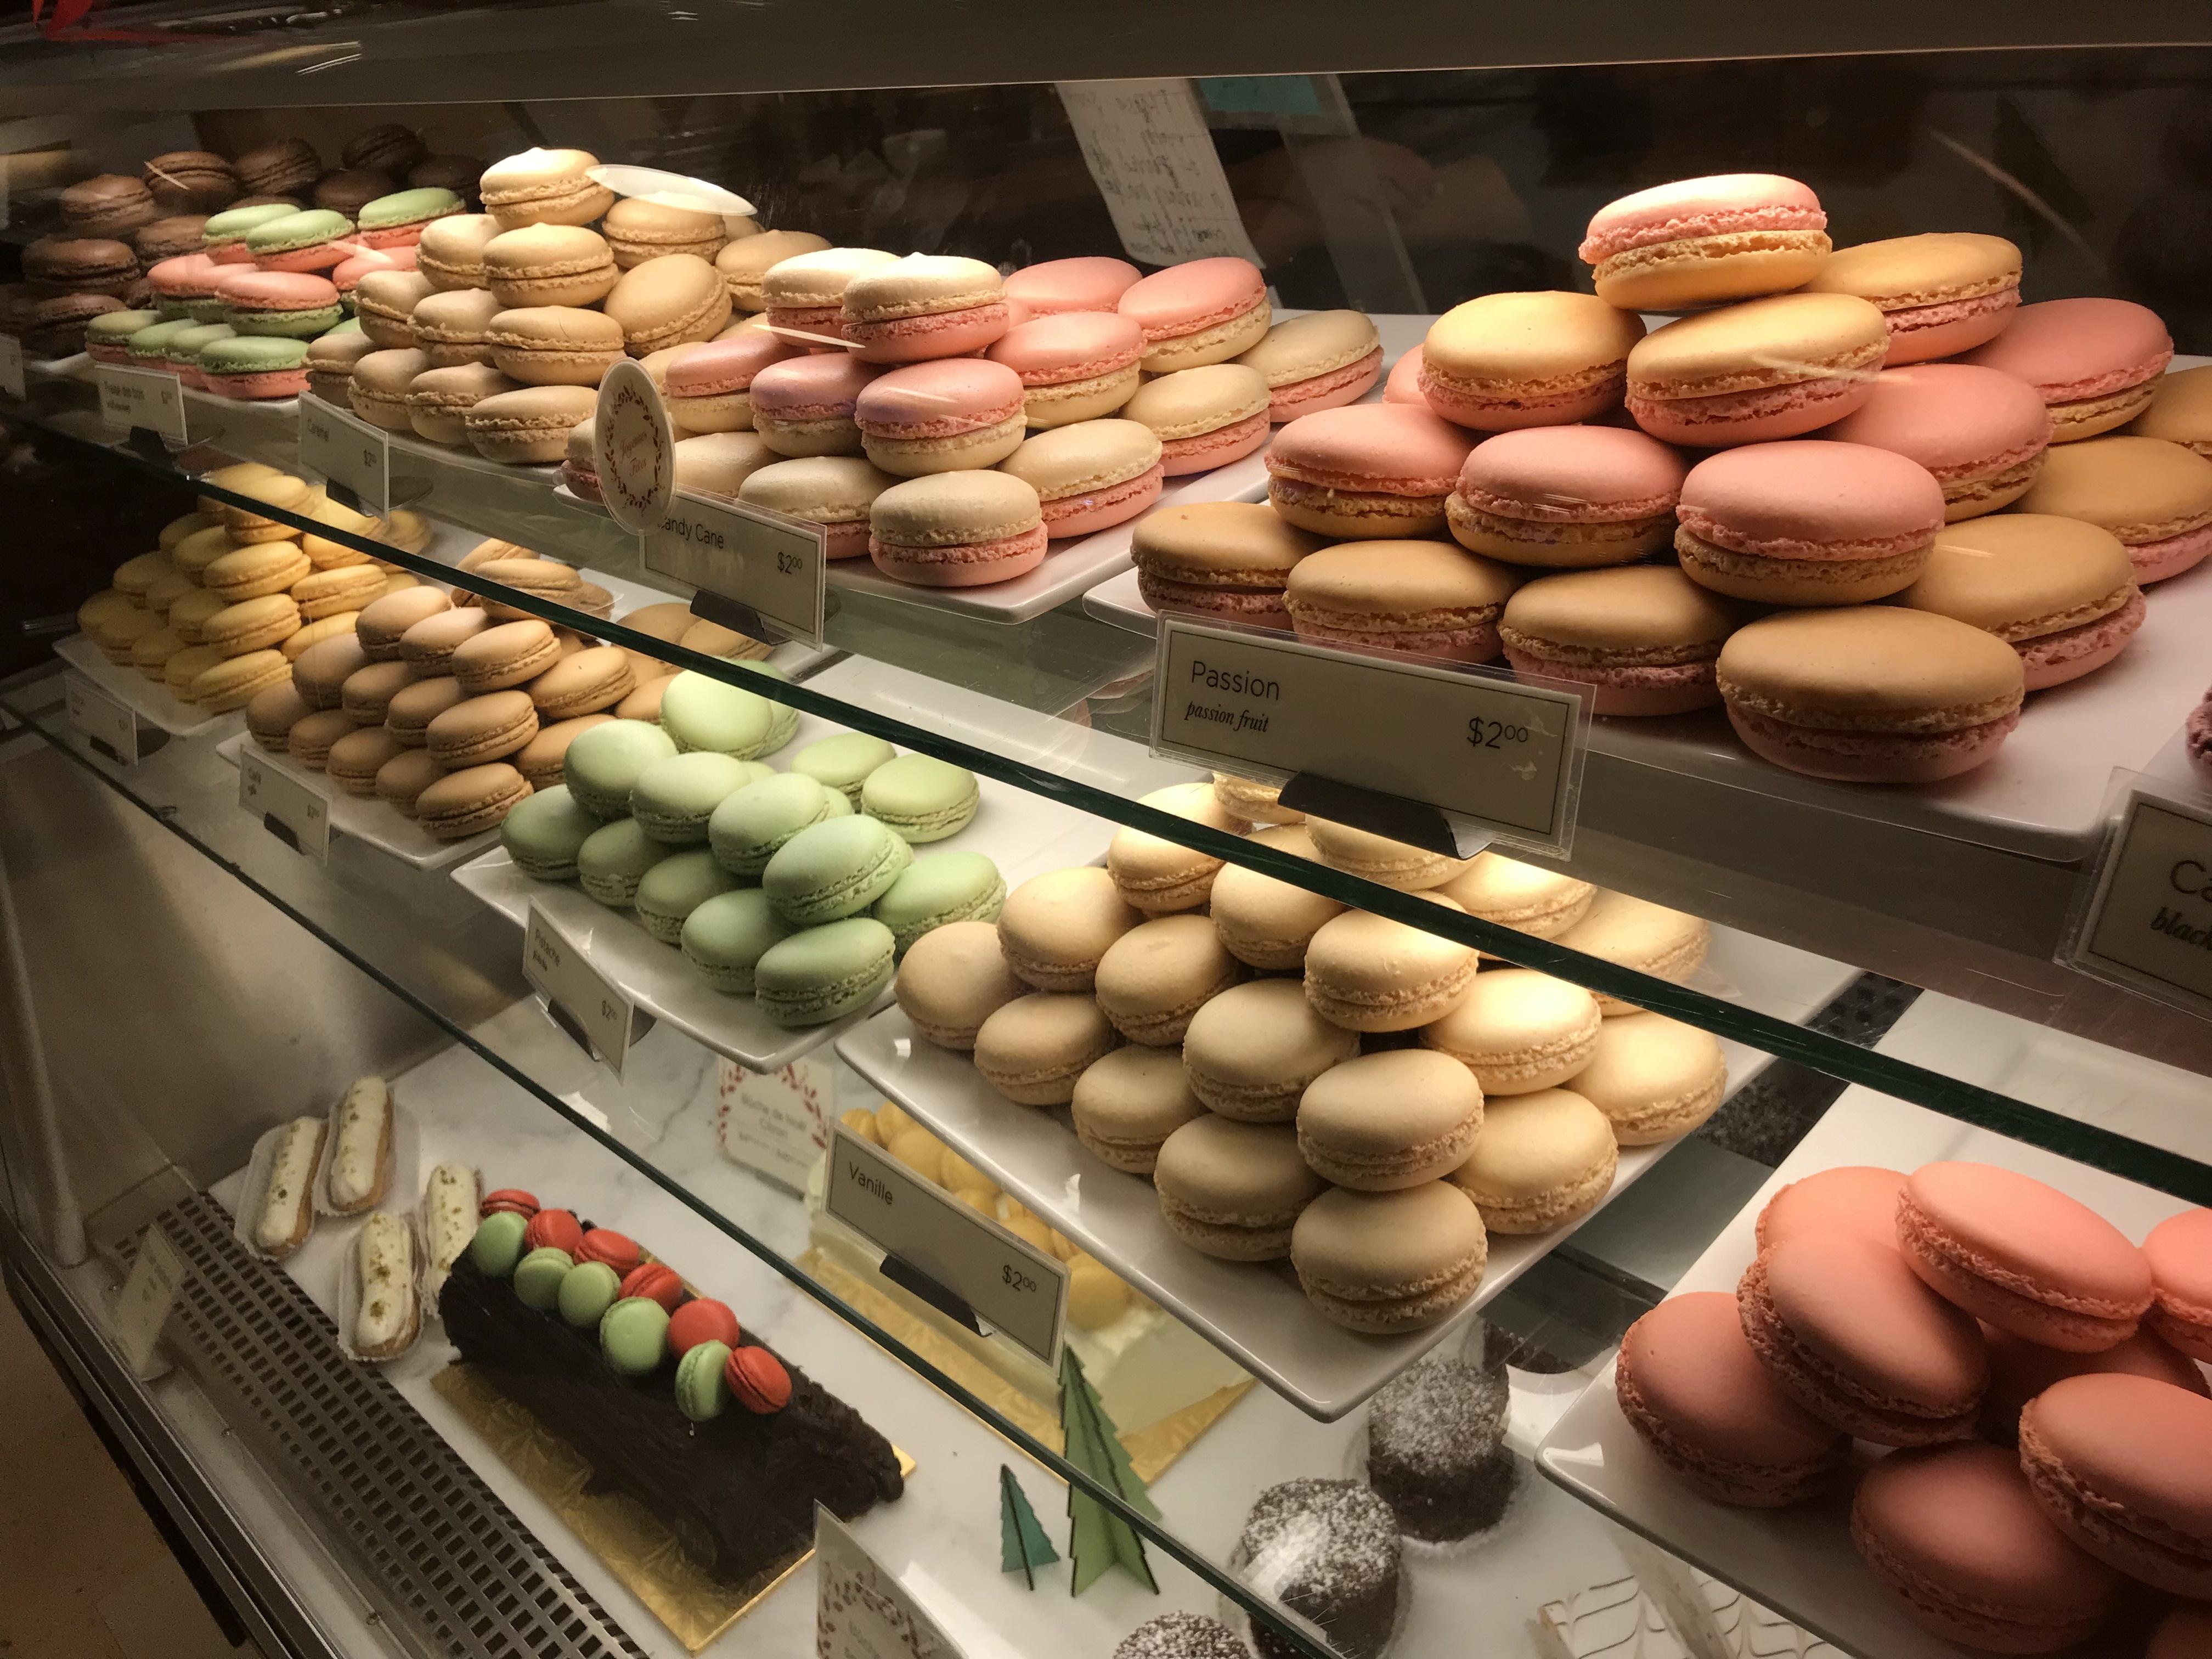 le panier very french bakery restaurants seattle met le panier very french bakery